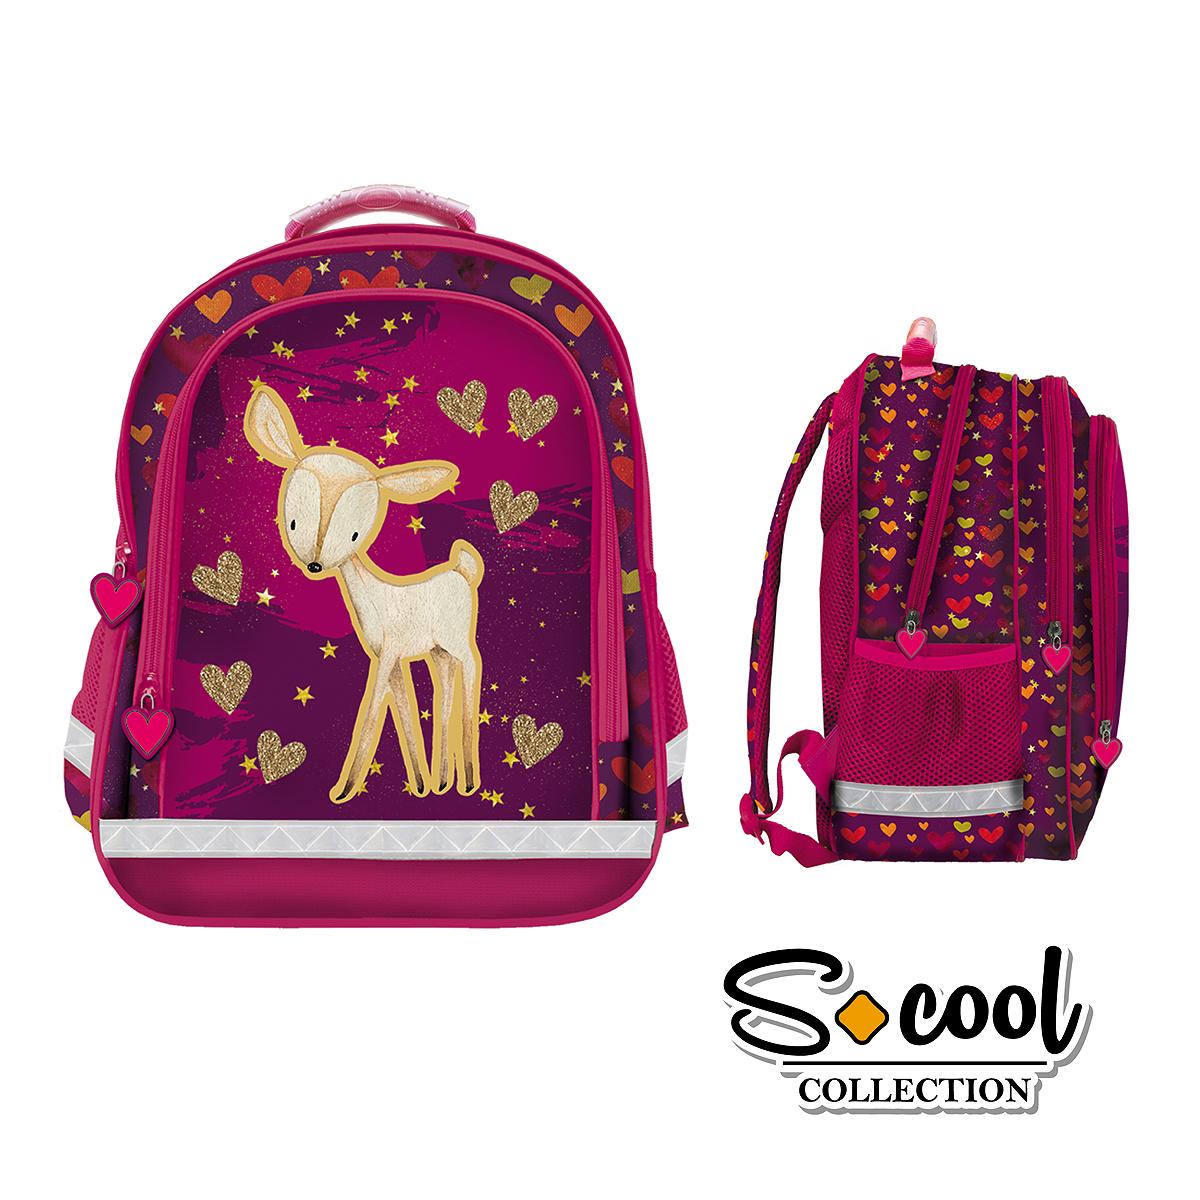 Rucsac Școlar cu Trei Compartimente, Roz, Sweet Girl, S-Cool, SC880